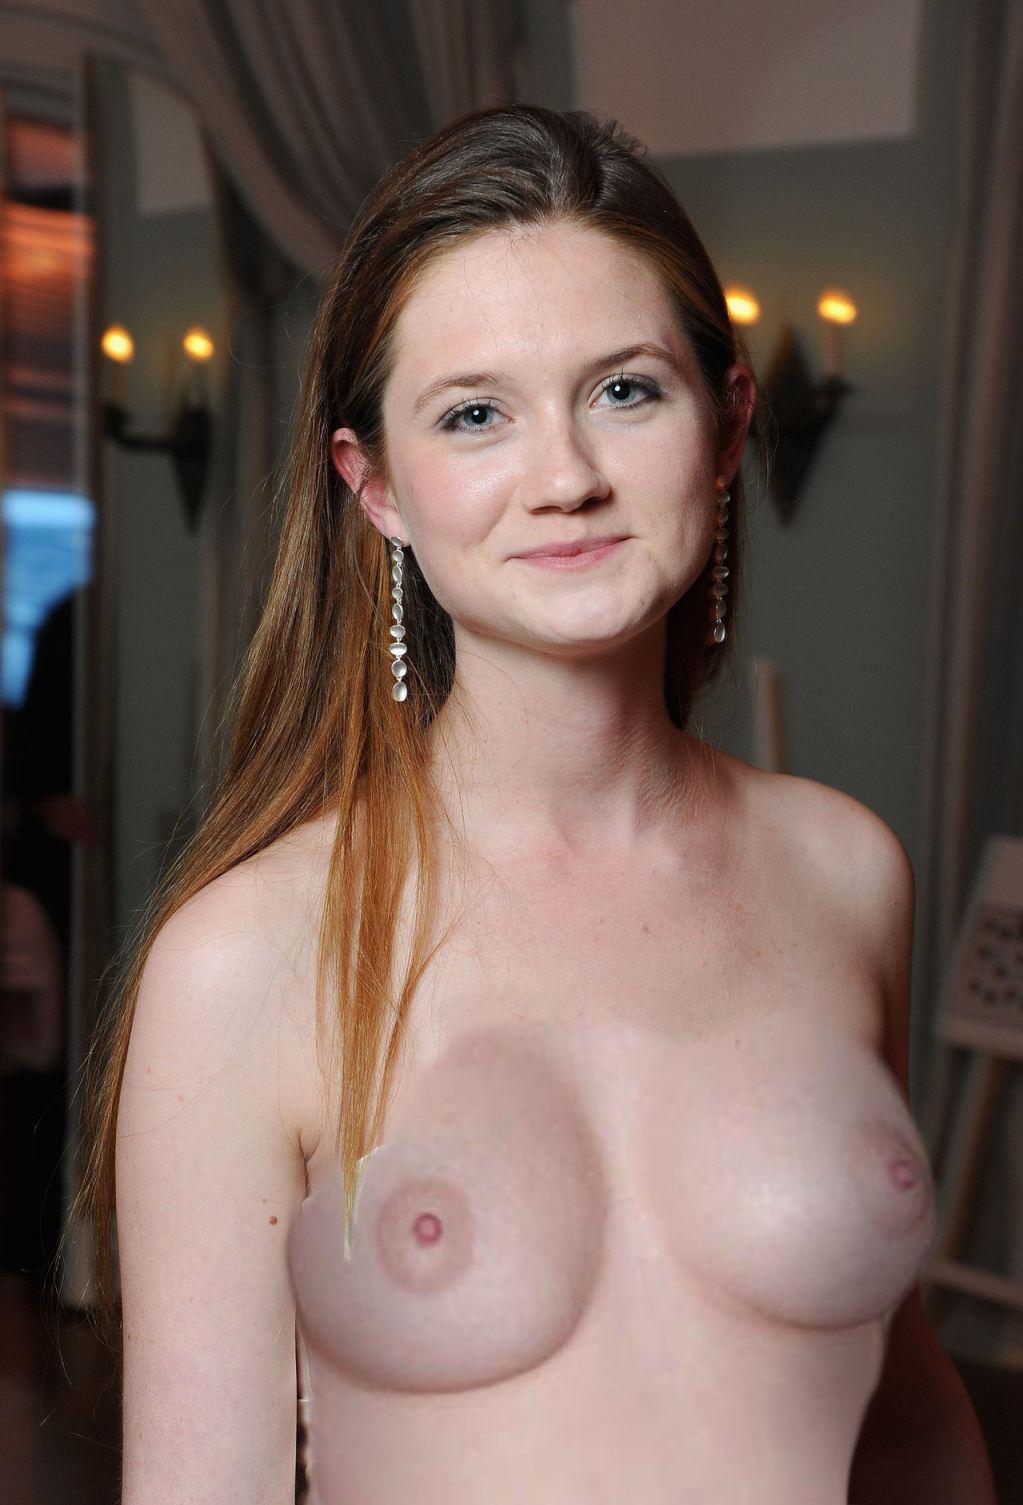 Luna lovegood fake naked